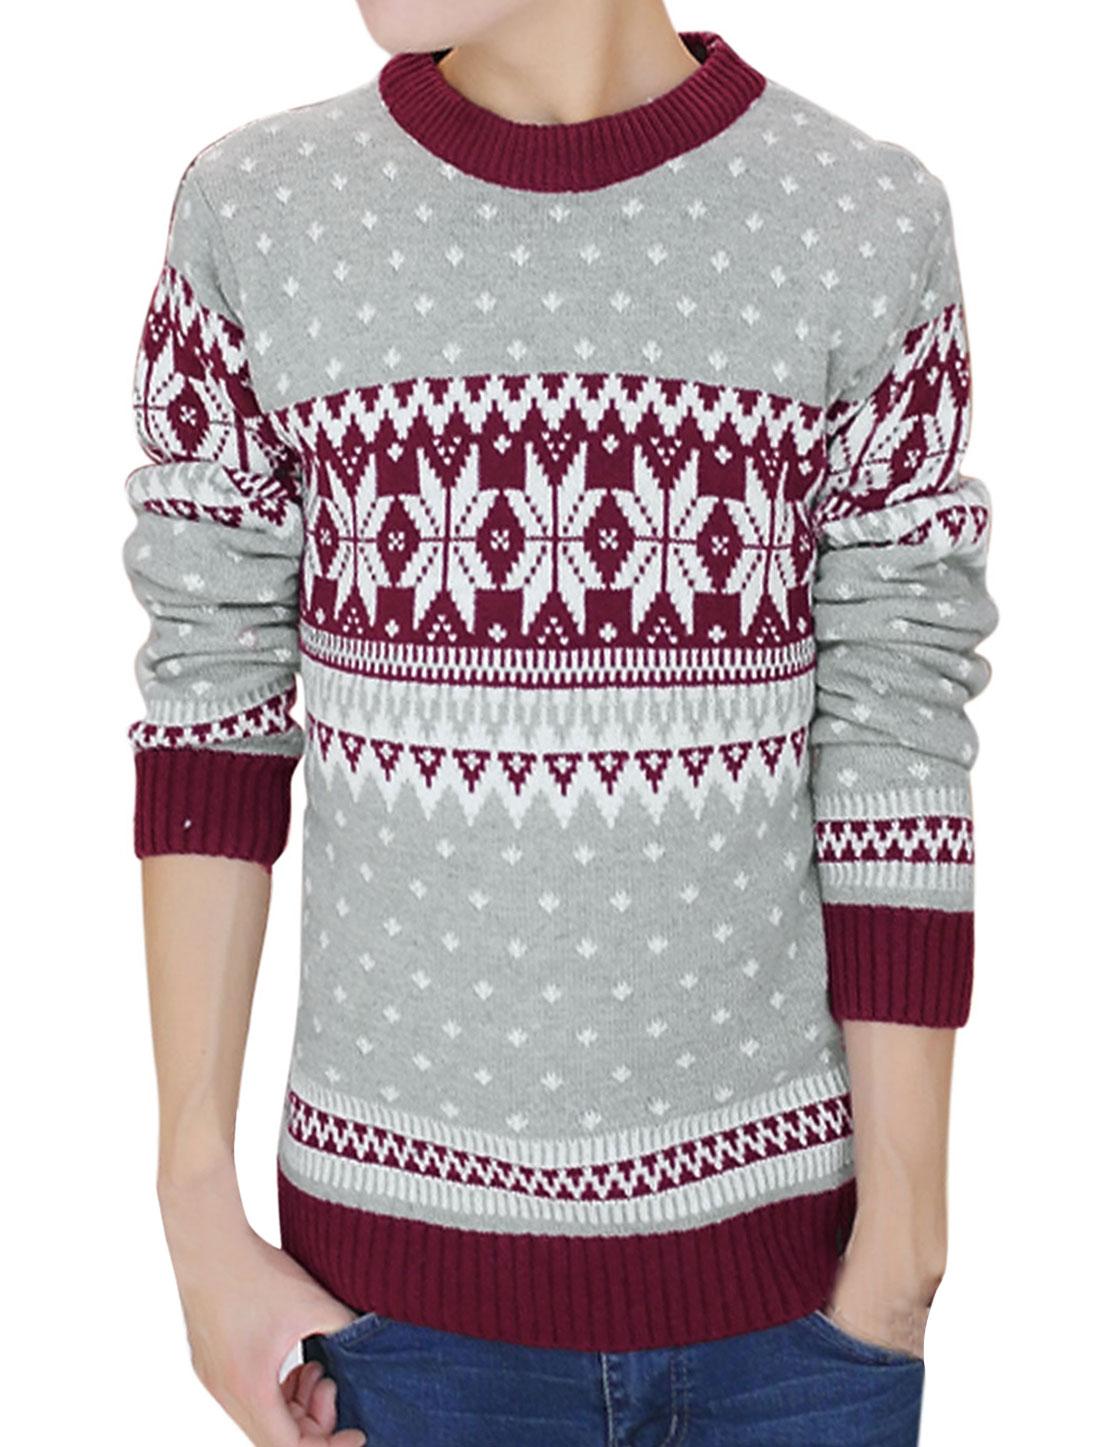 Men Long Sleeve Ribbed Trim Slipover Casual Sweater Burgundy M